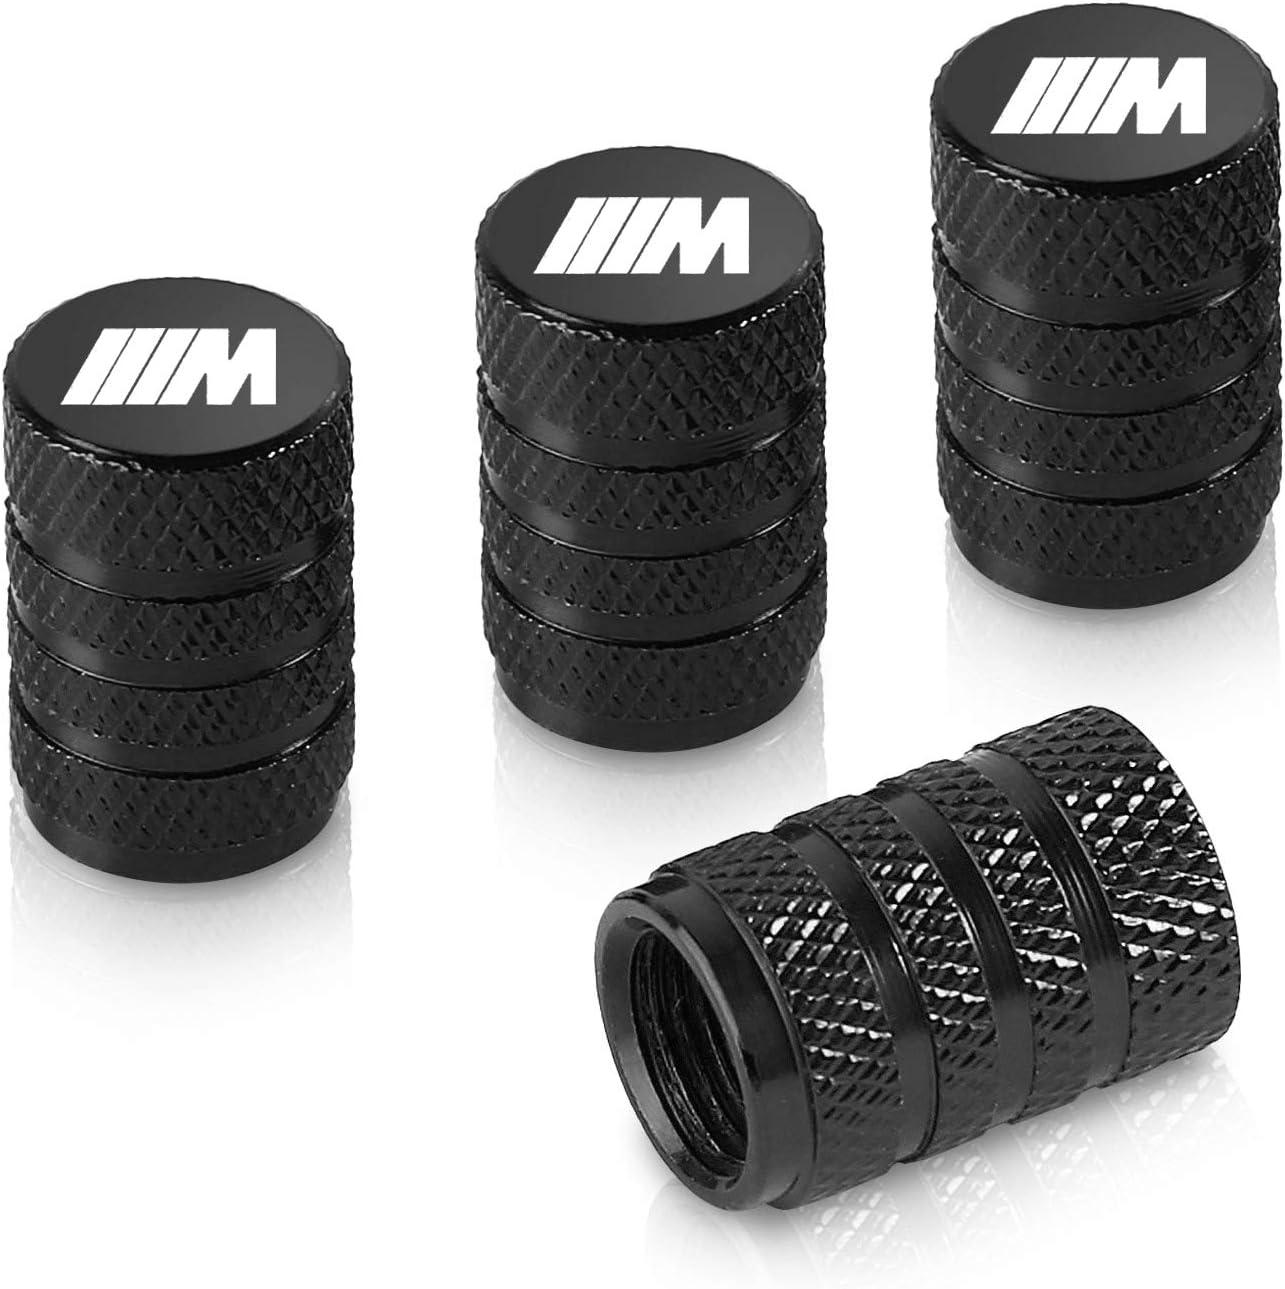 Qideloon Tire Valve Caps,Aluminum Valve Stem Caps Compatible with BMW Accessories Car,Trucks,Motorbike 4pcs Blue